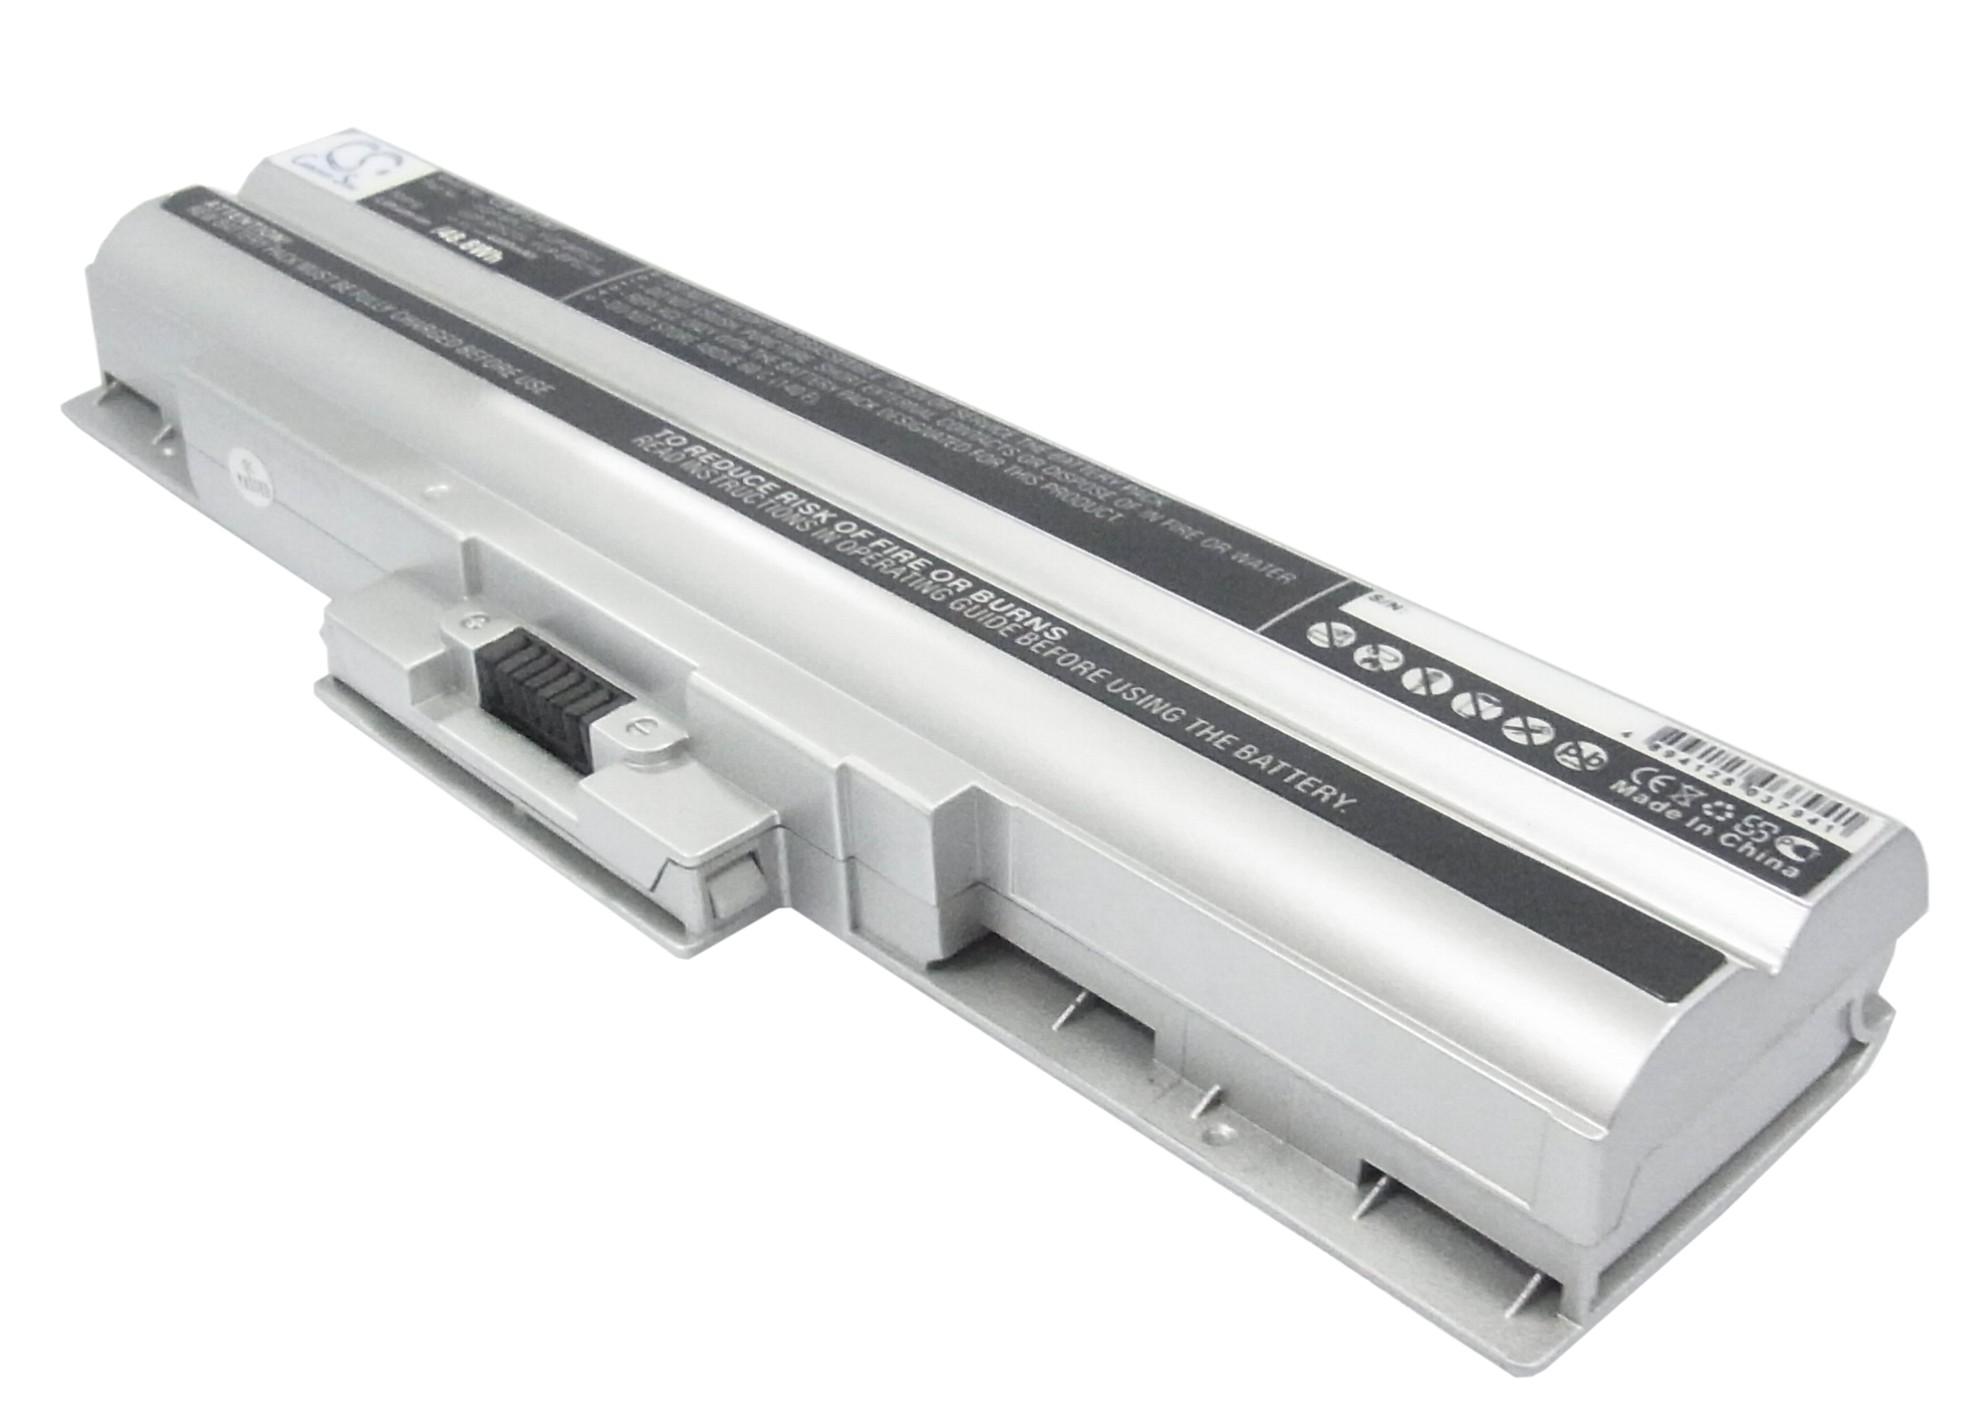 Cameron Sino baterie do notebooků pro SONY VAIO VGN-CS36GJ/R 11.1V Li-ion 4400mAh stříbrná - neoriginální